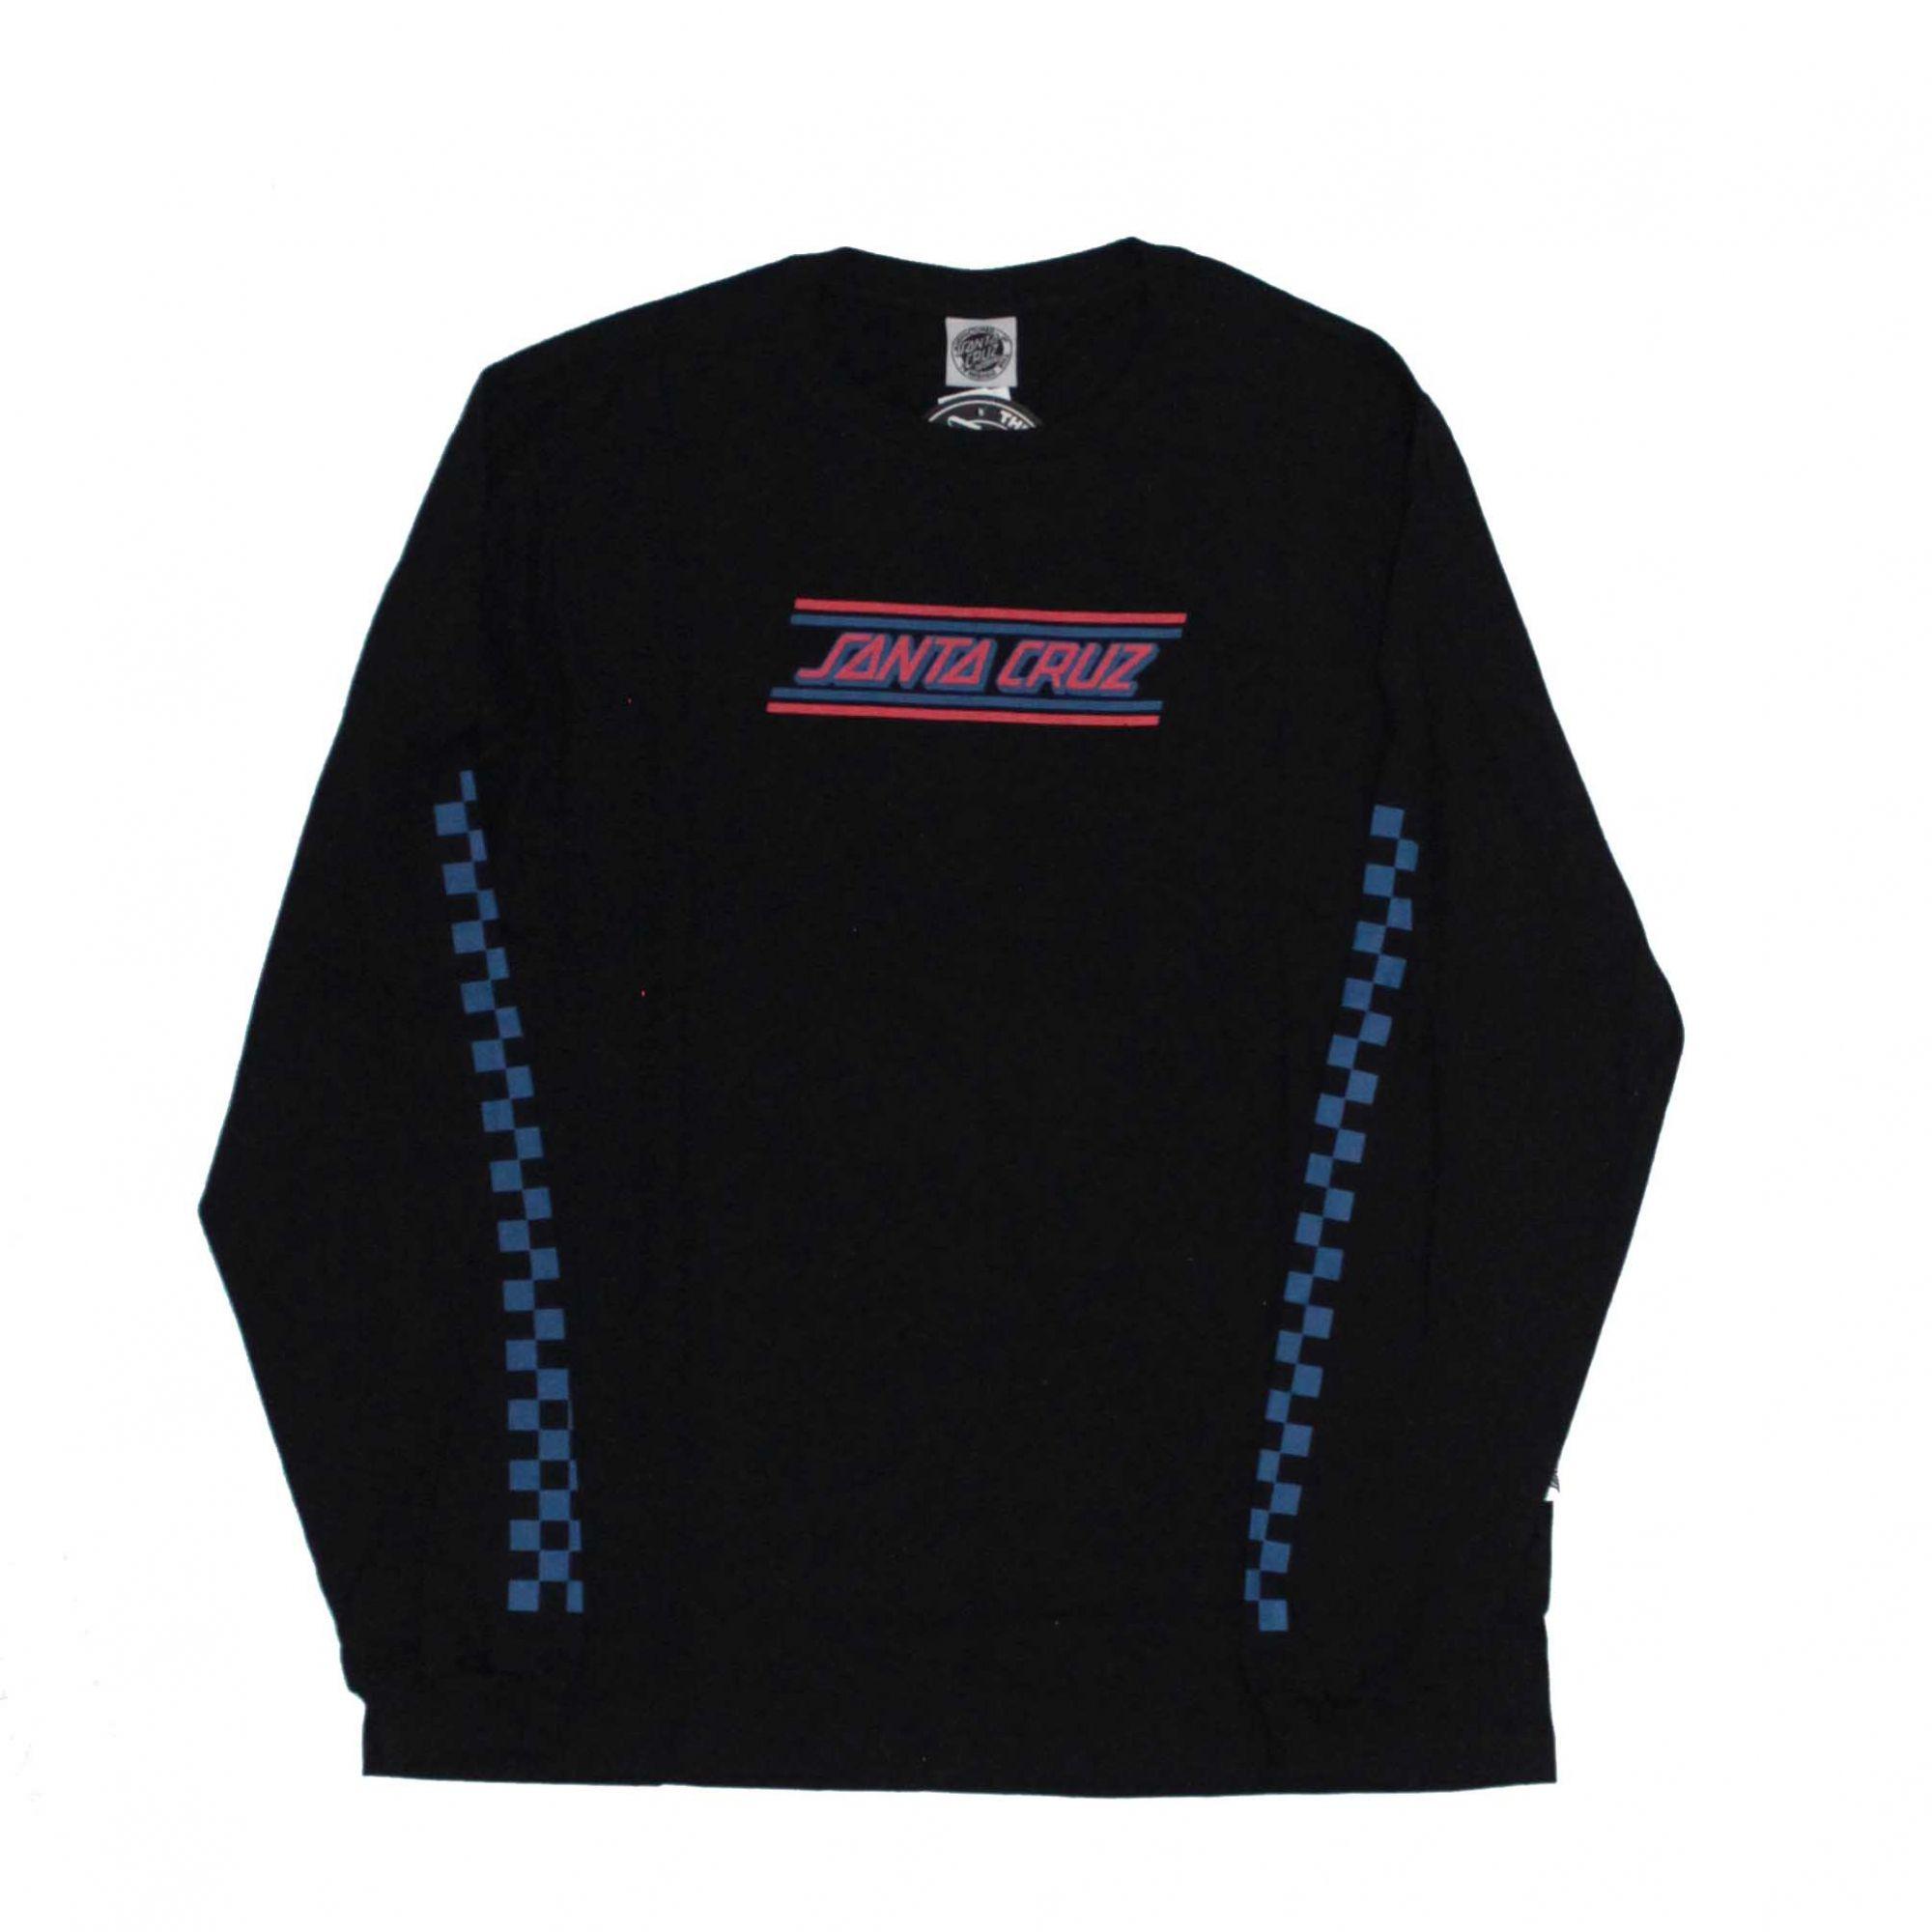 Camiseta Manga Longa Santa Cruz Check Strip Hue - Preto